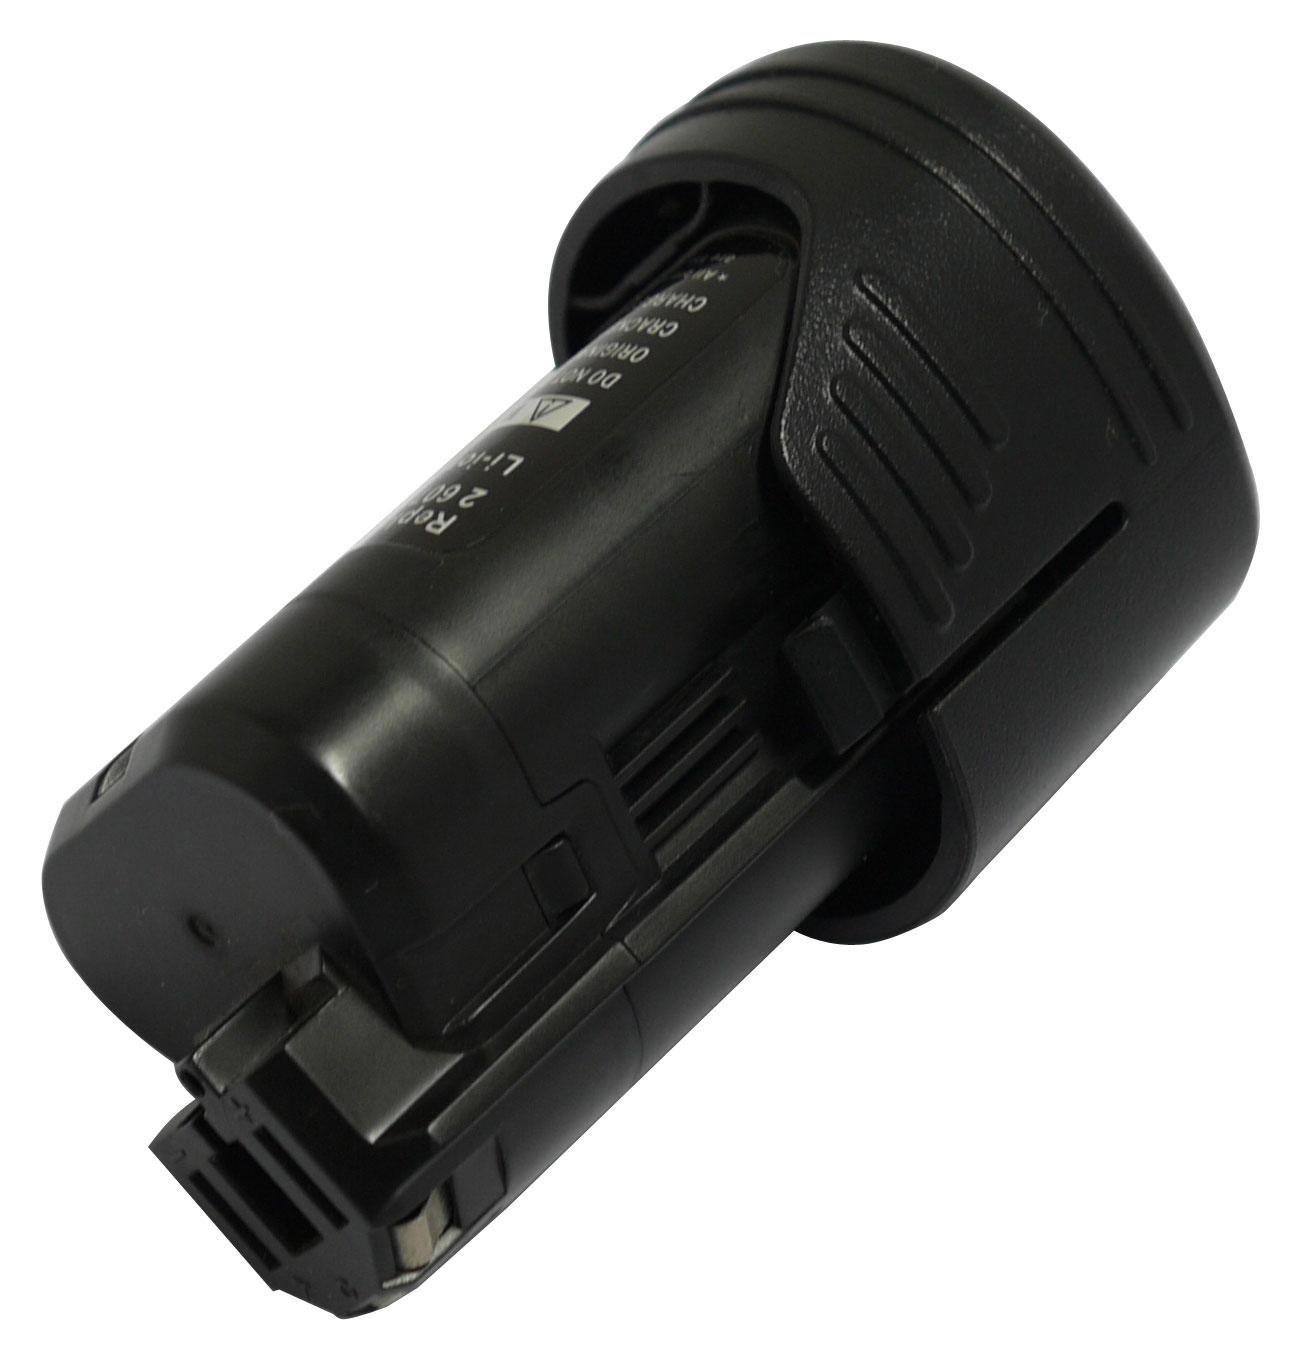 Master 10.8 0700996210 700/996/213 S de 10/a Power 0700996213 Power Smart 1500/mAh 10.80/V bater/ía de ion de litio para W/ürth 07006522